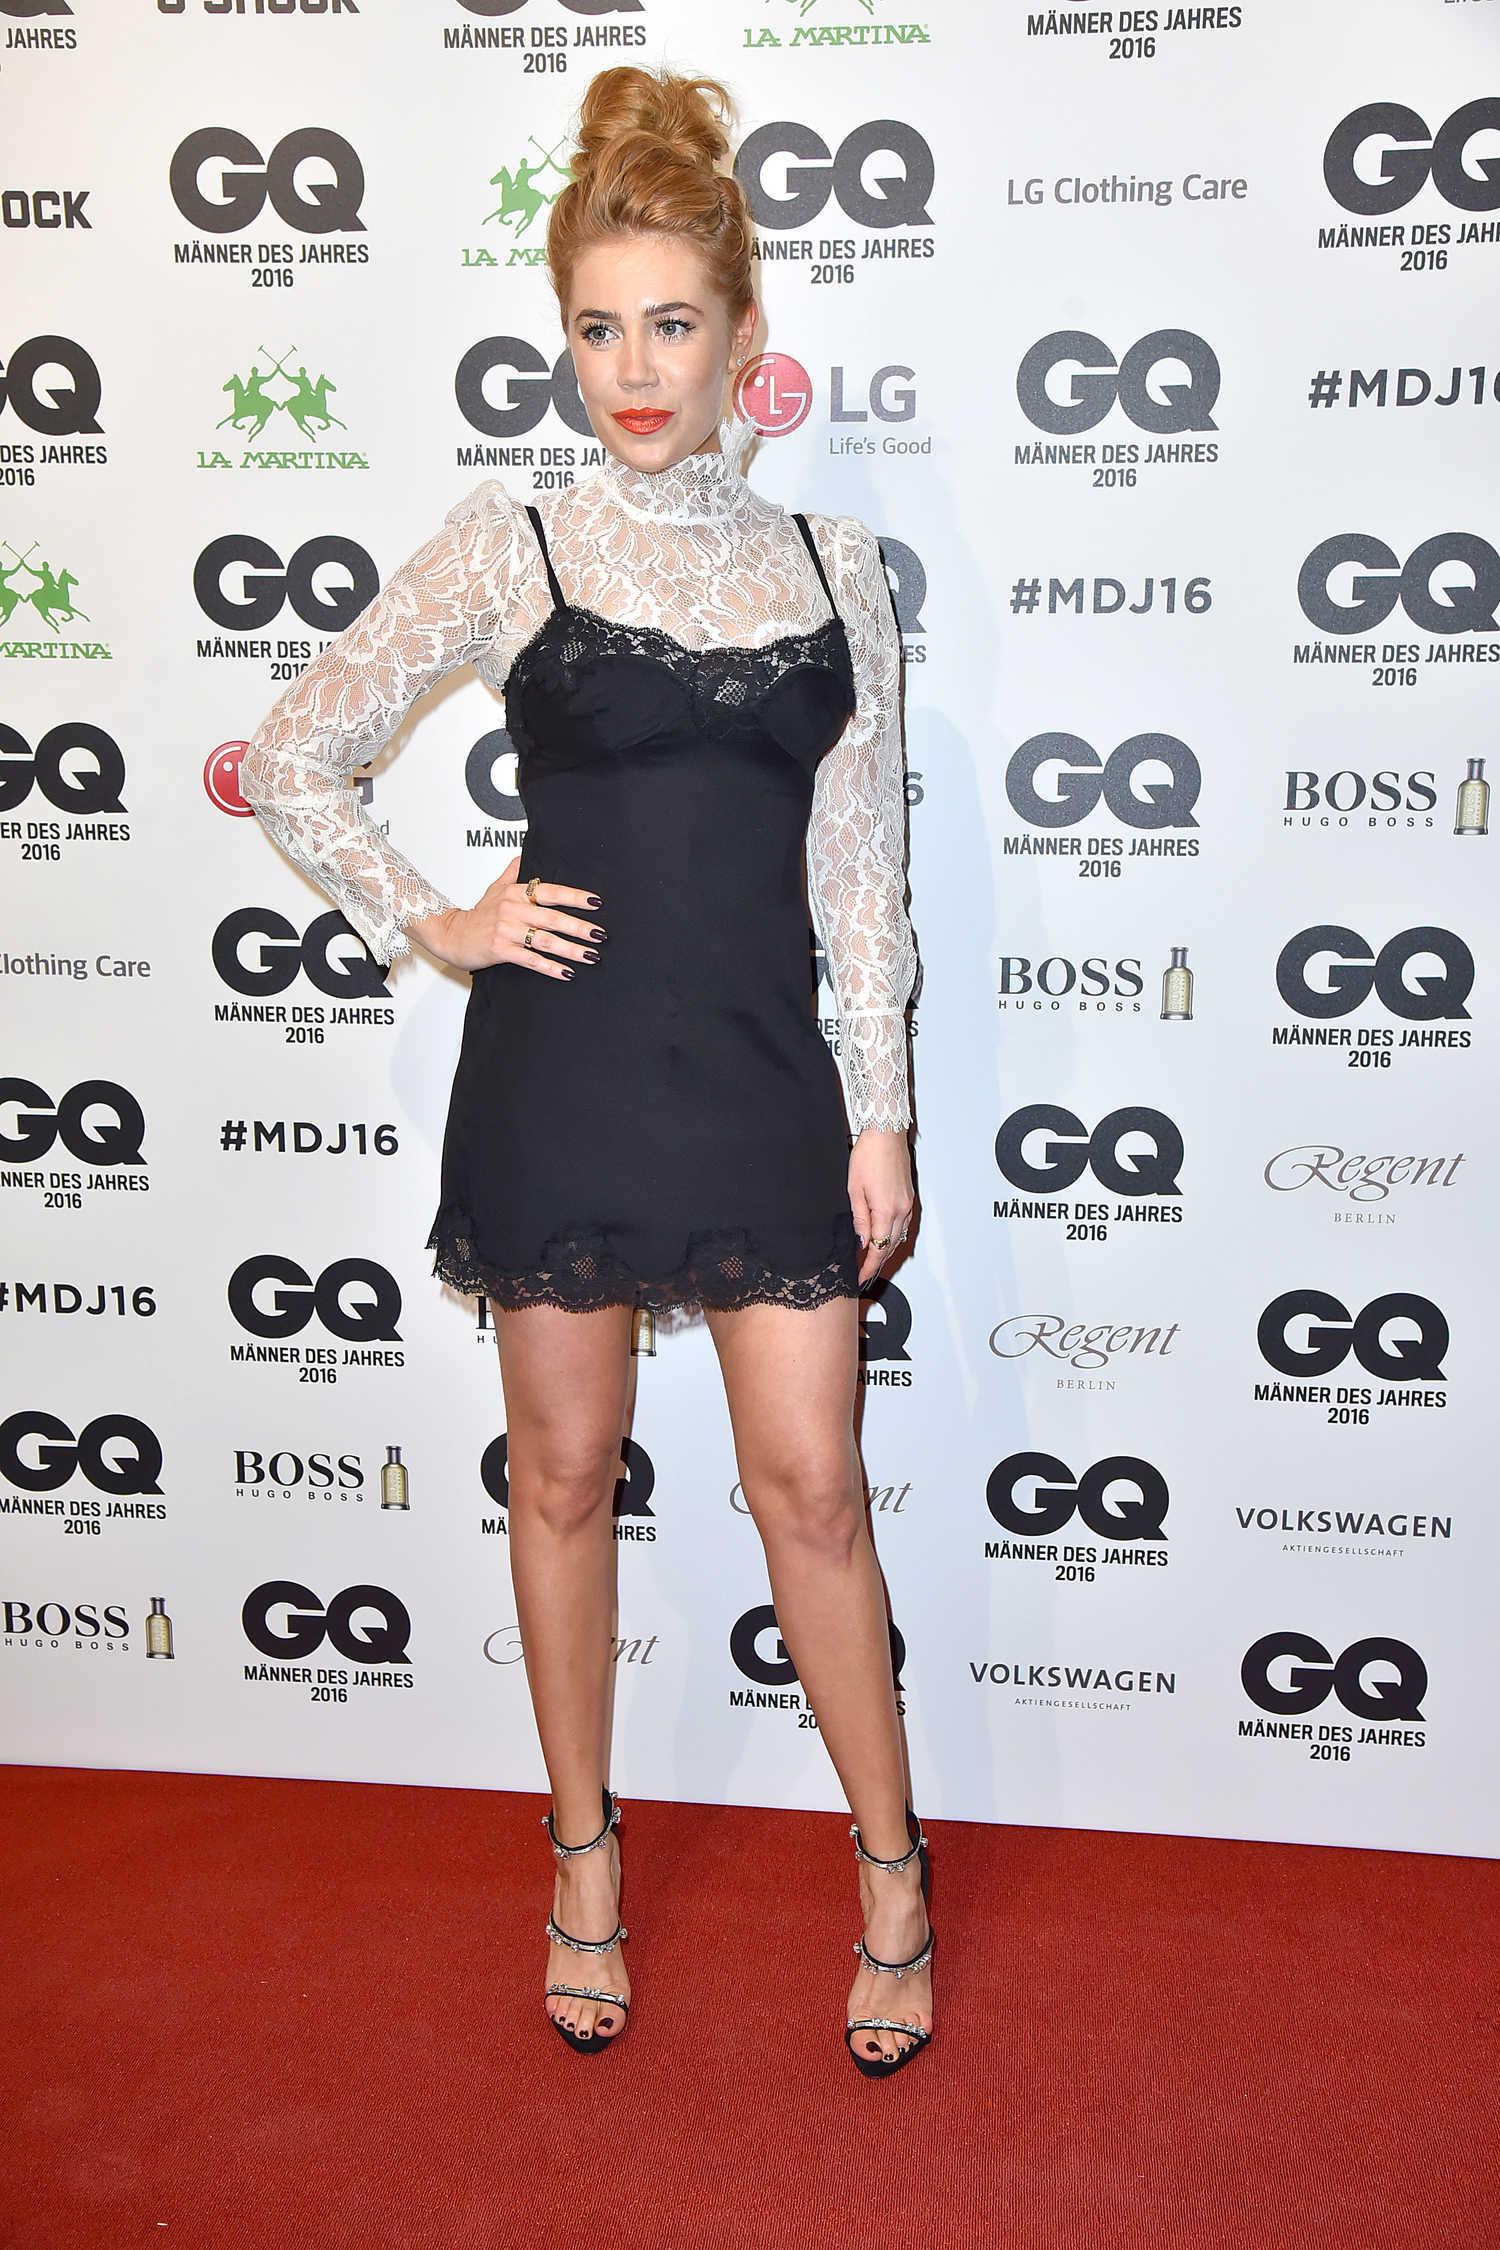 Palina Rojinski at the GQ Men of the Year Awards in Berlin